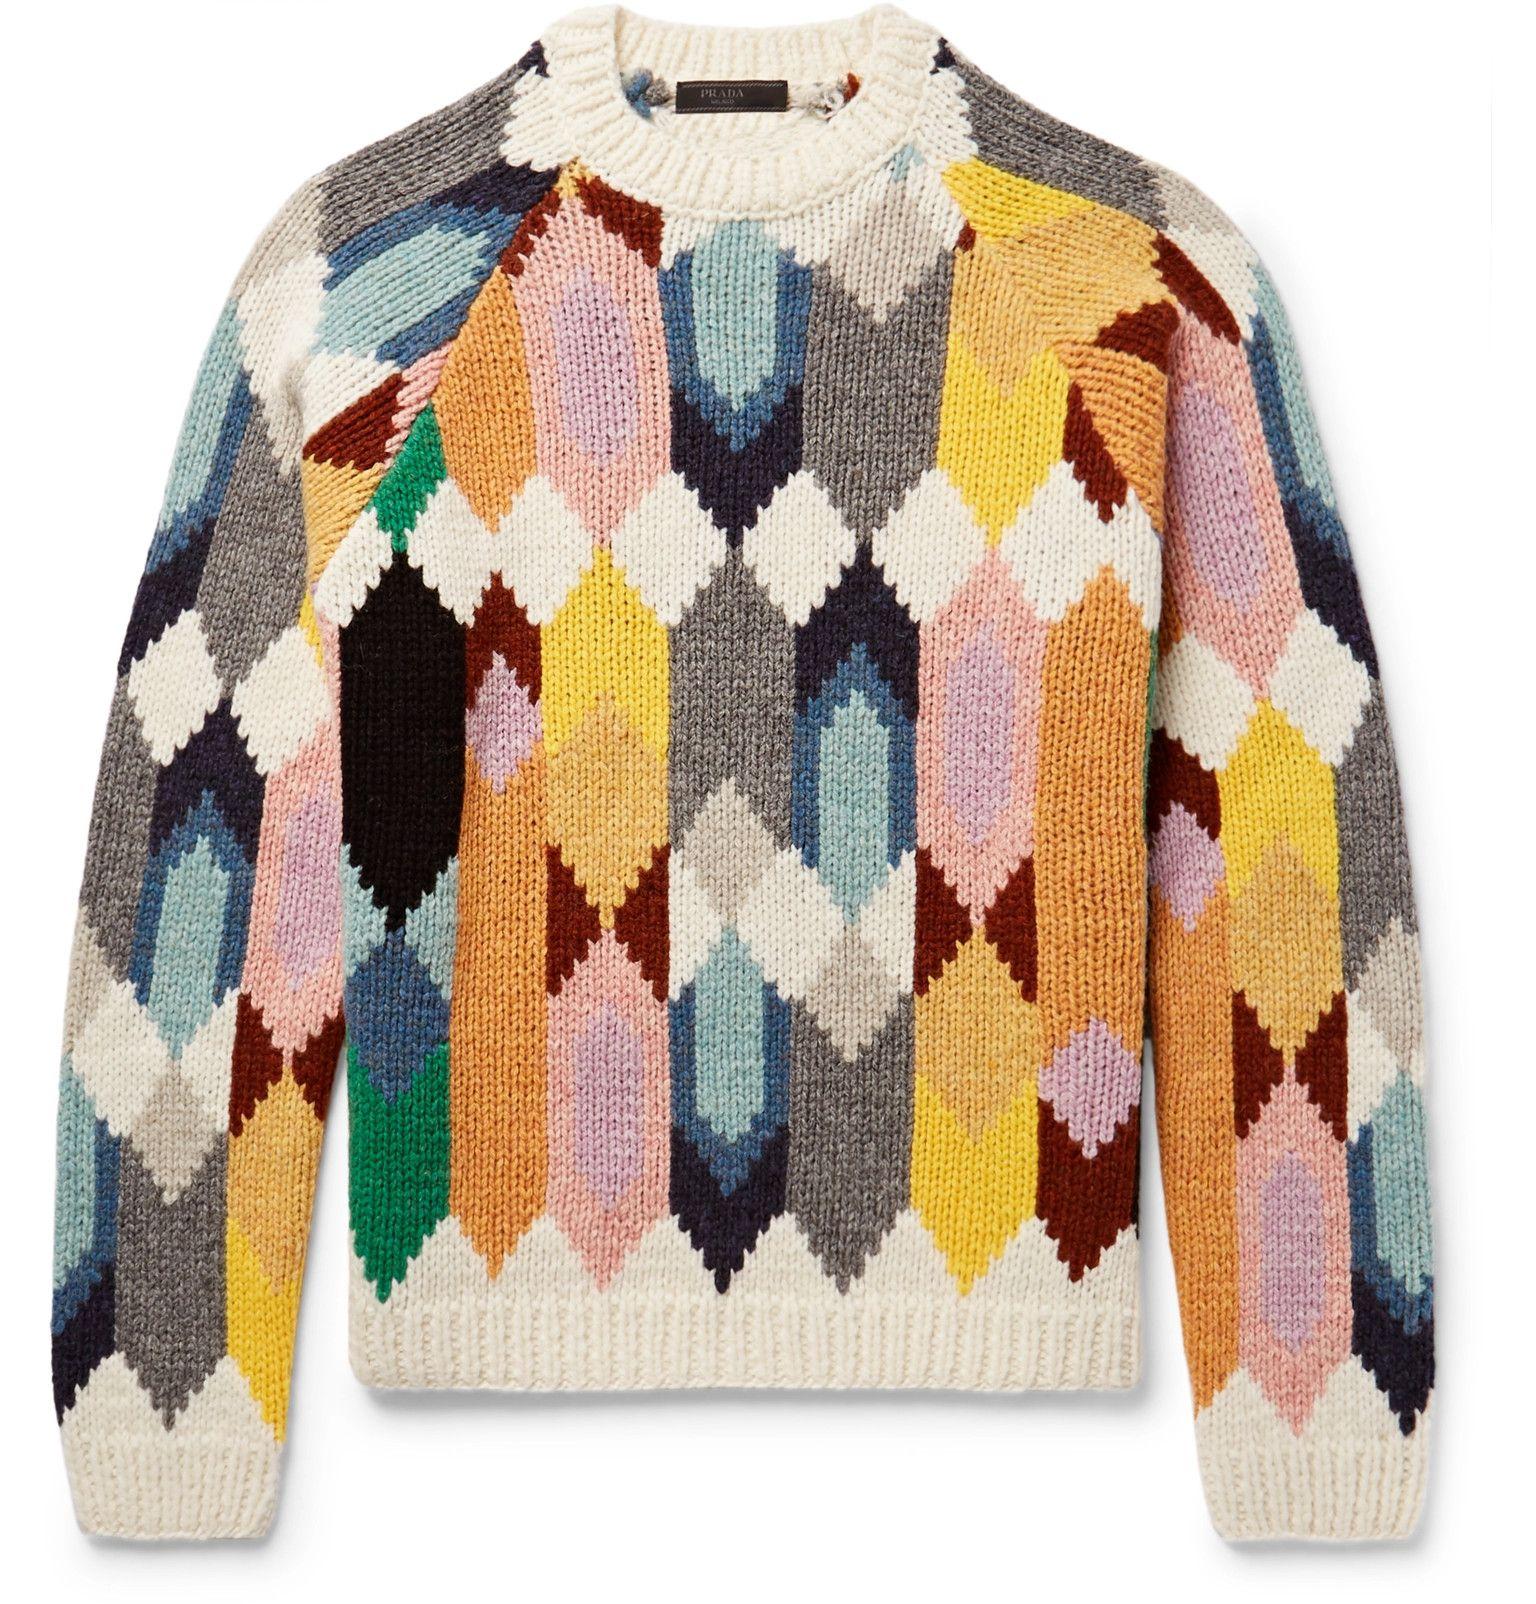 PRADA Shetland Wool Sweater | Men\'s Fall-Winter 2017-2018 | Pinterest